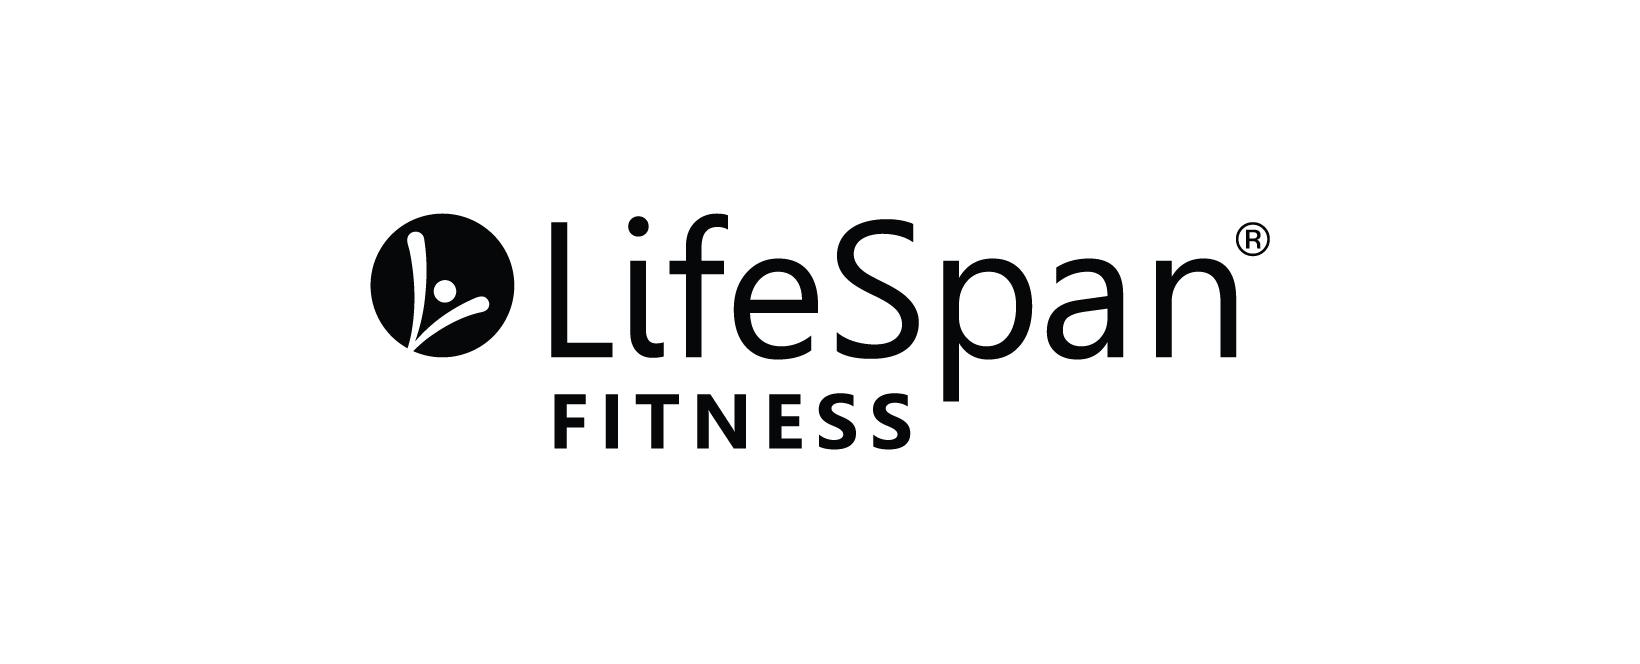 LifeSpan Fitness Discount Code 2021